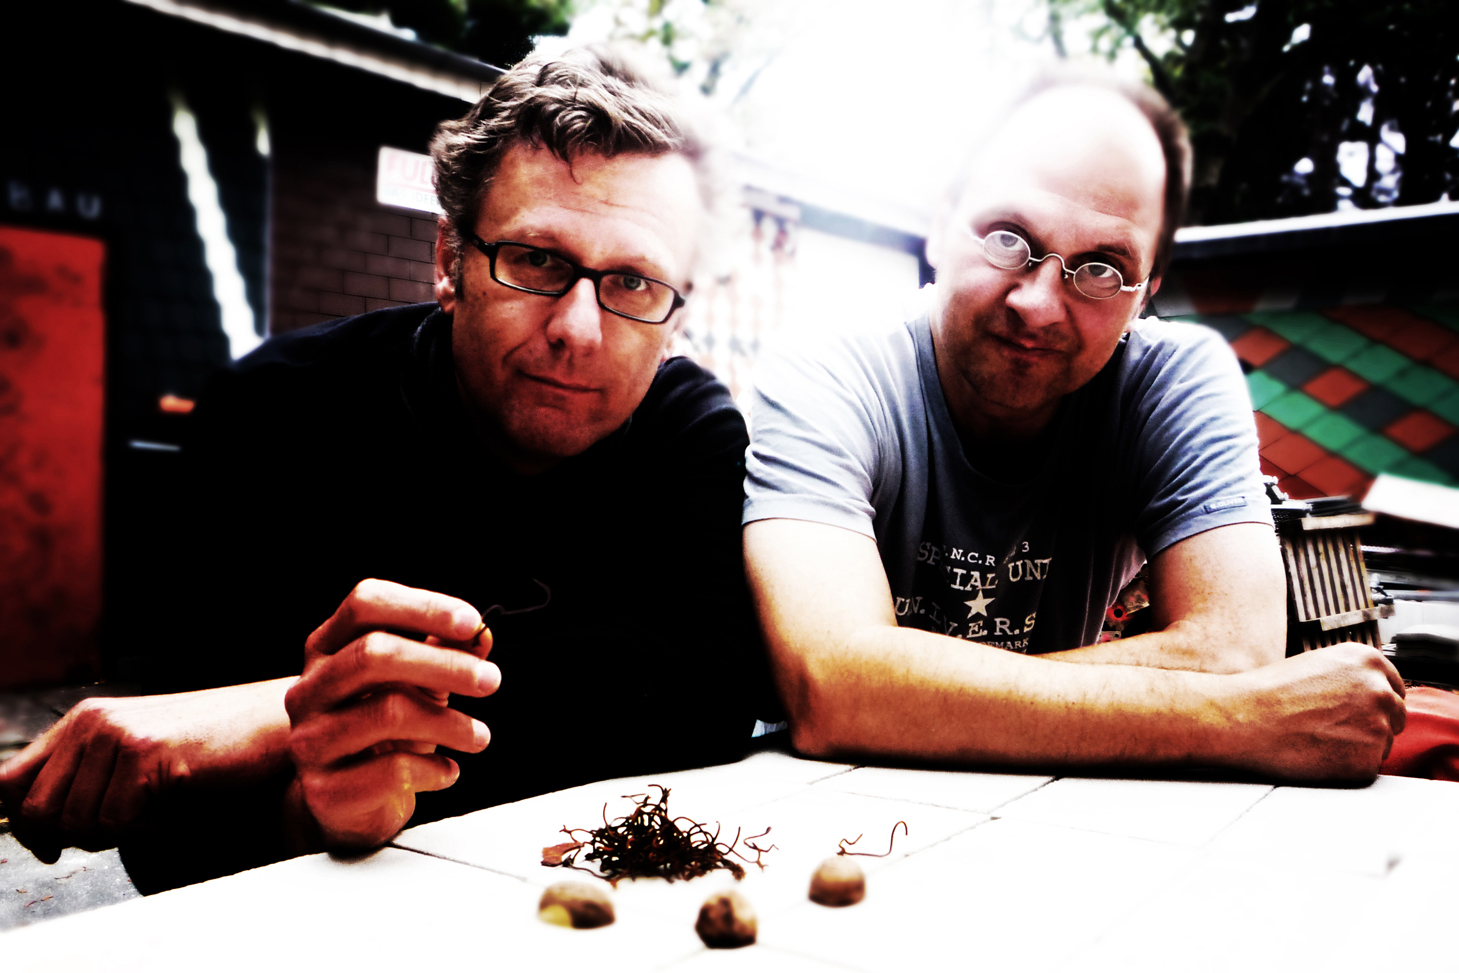 Uwe Oberg & Christof Thewes + Wolfram Knauer